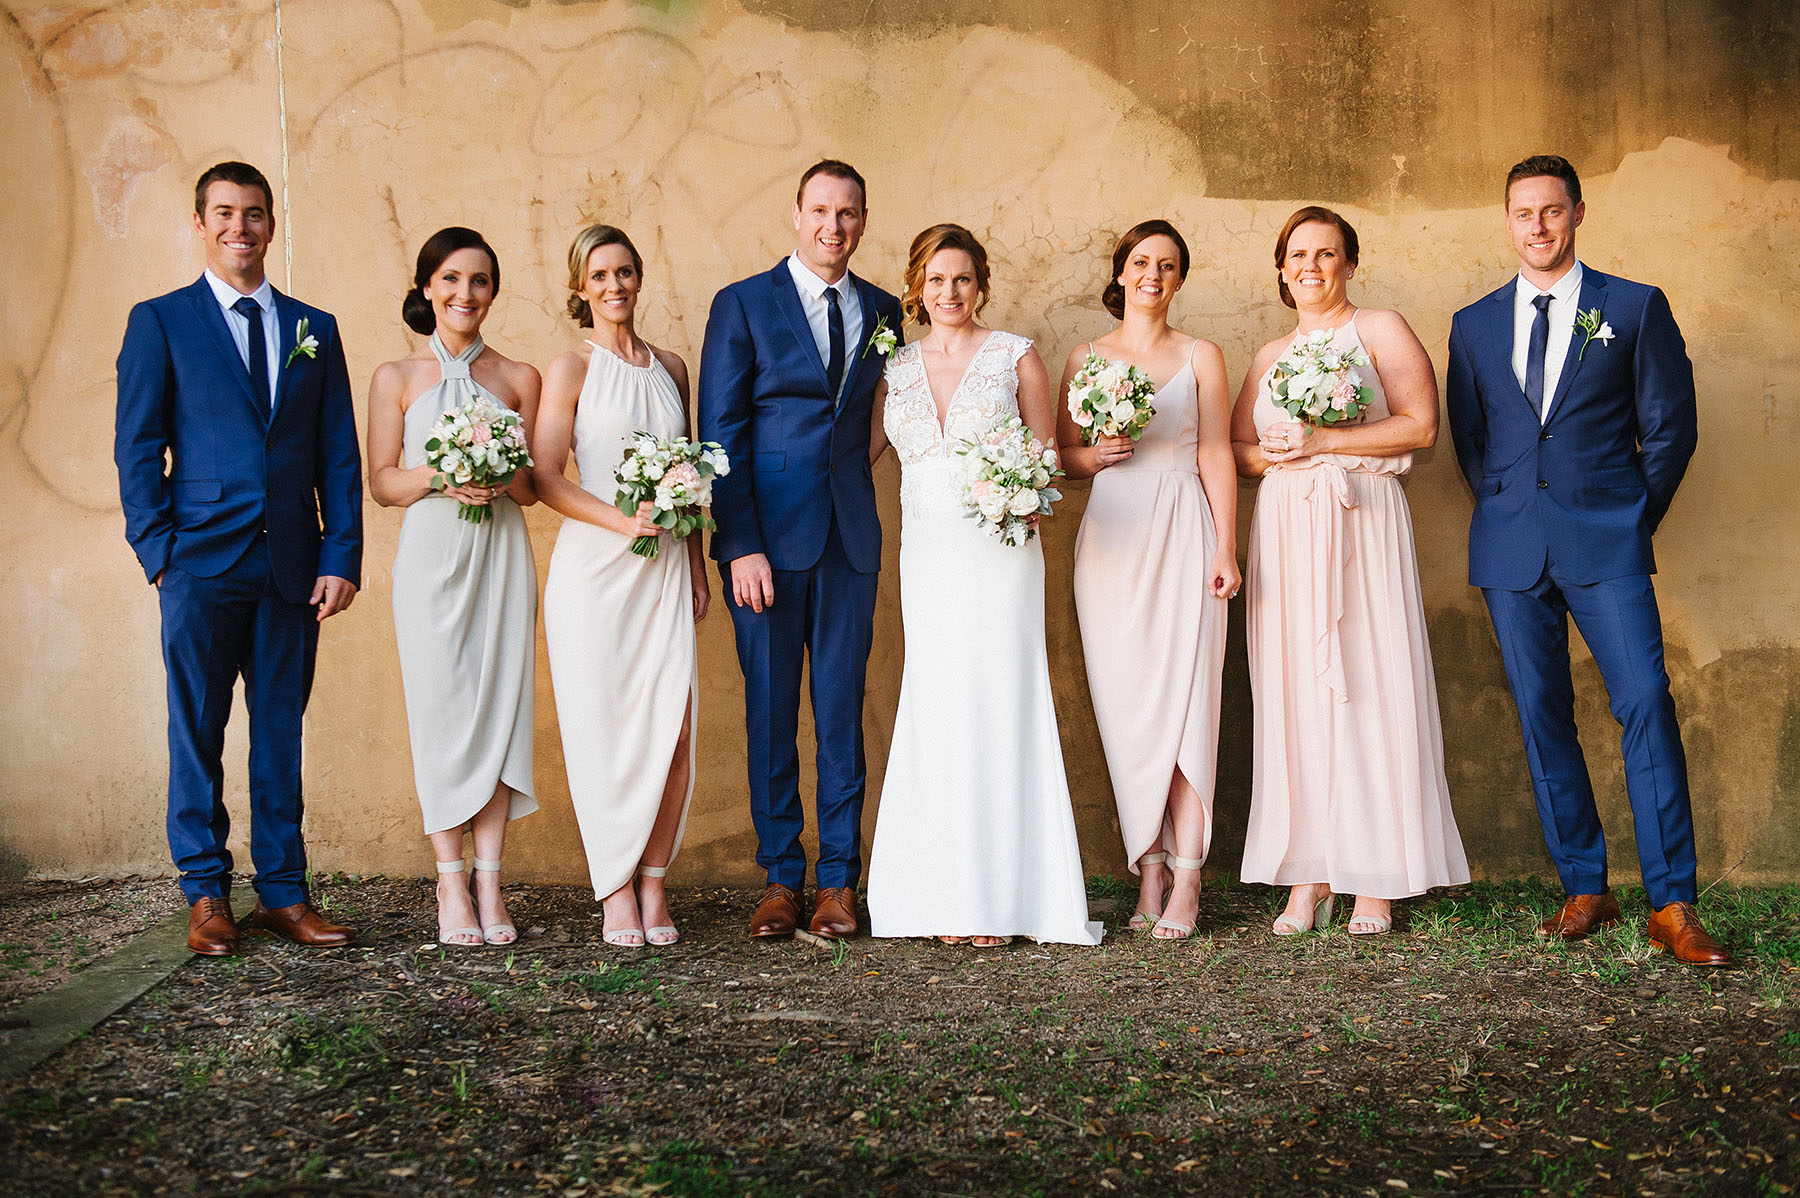 Marryme_wedding_photography_dorrigo_bellingen_photographer_14.jpg